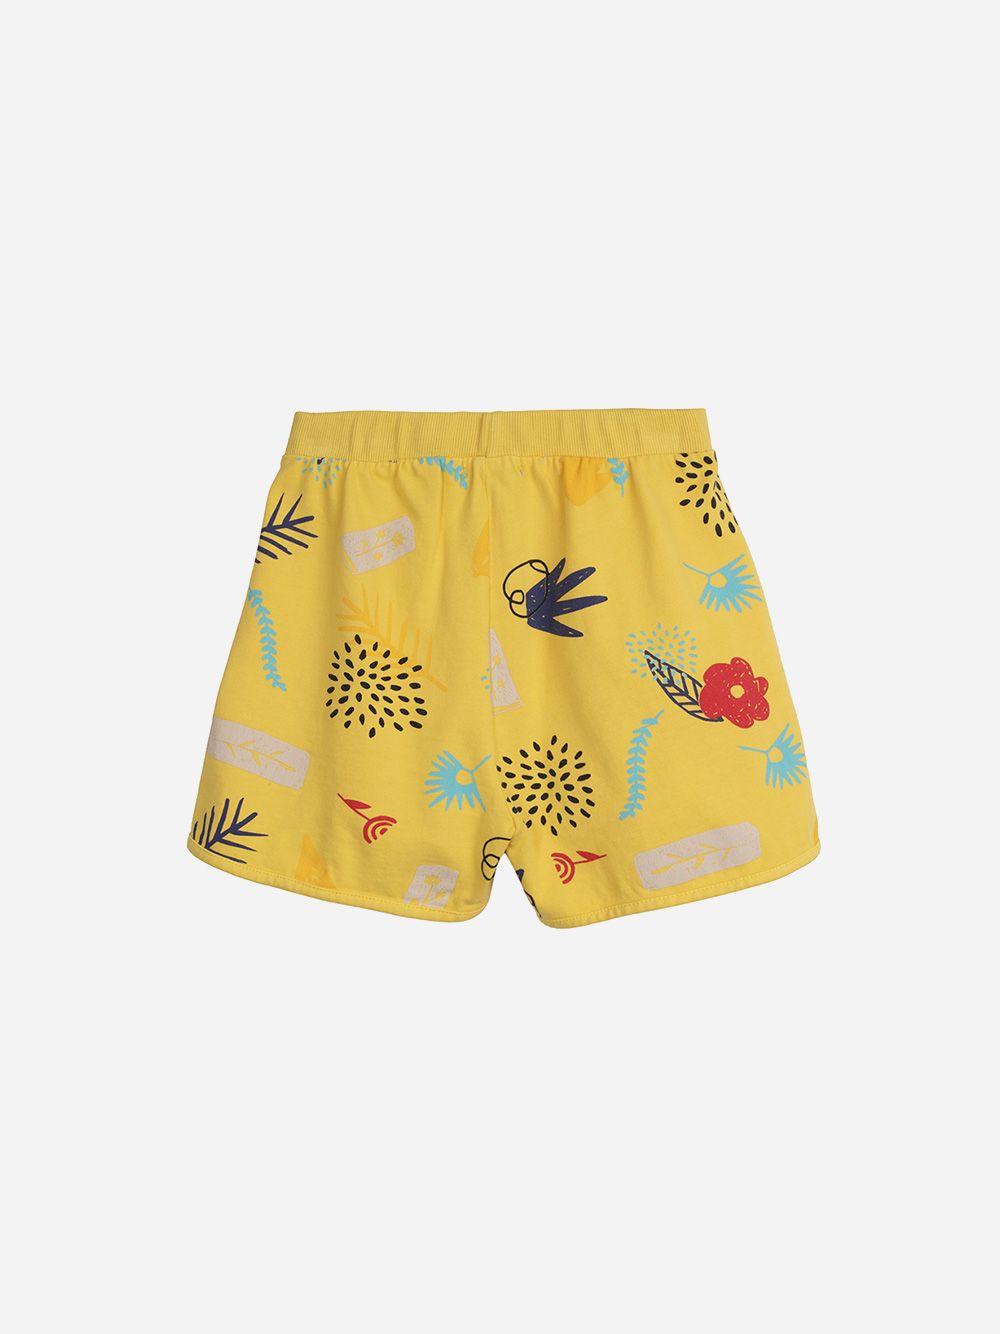 Calções Amarelos Daisy | Barn of Monkeys